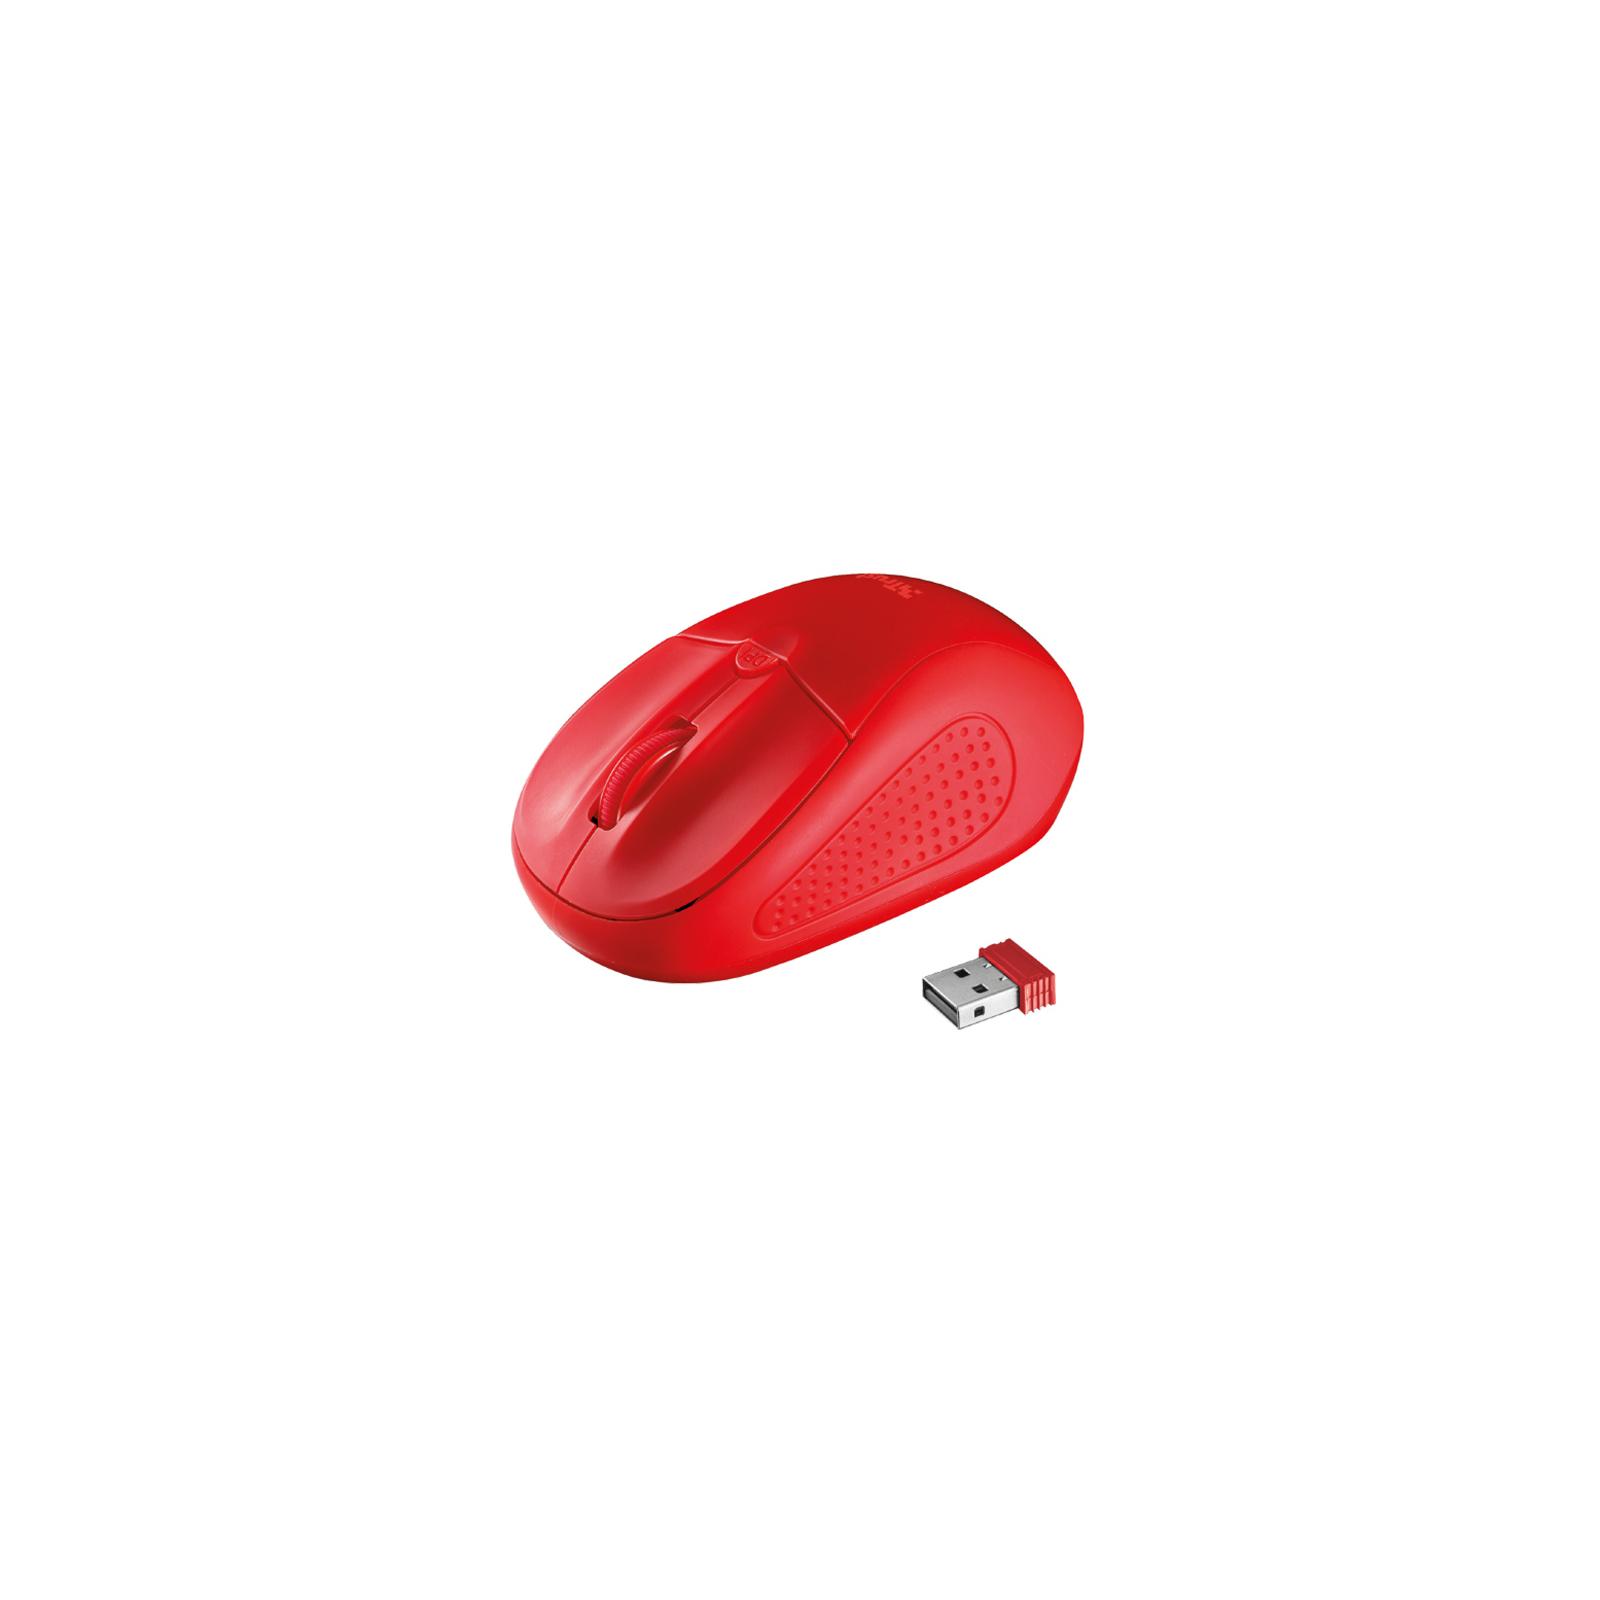 Мышка Trust Primo Wireless Mouse Red (20787)